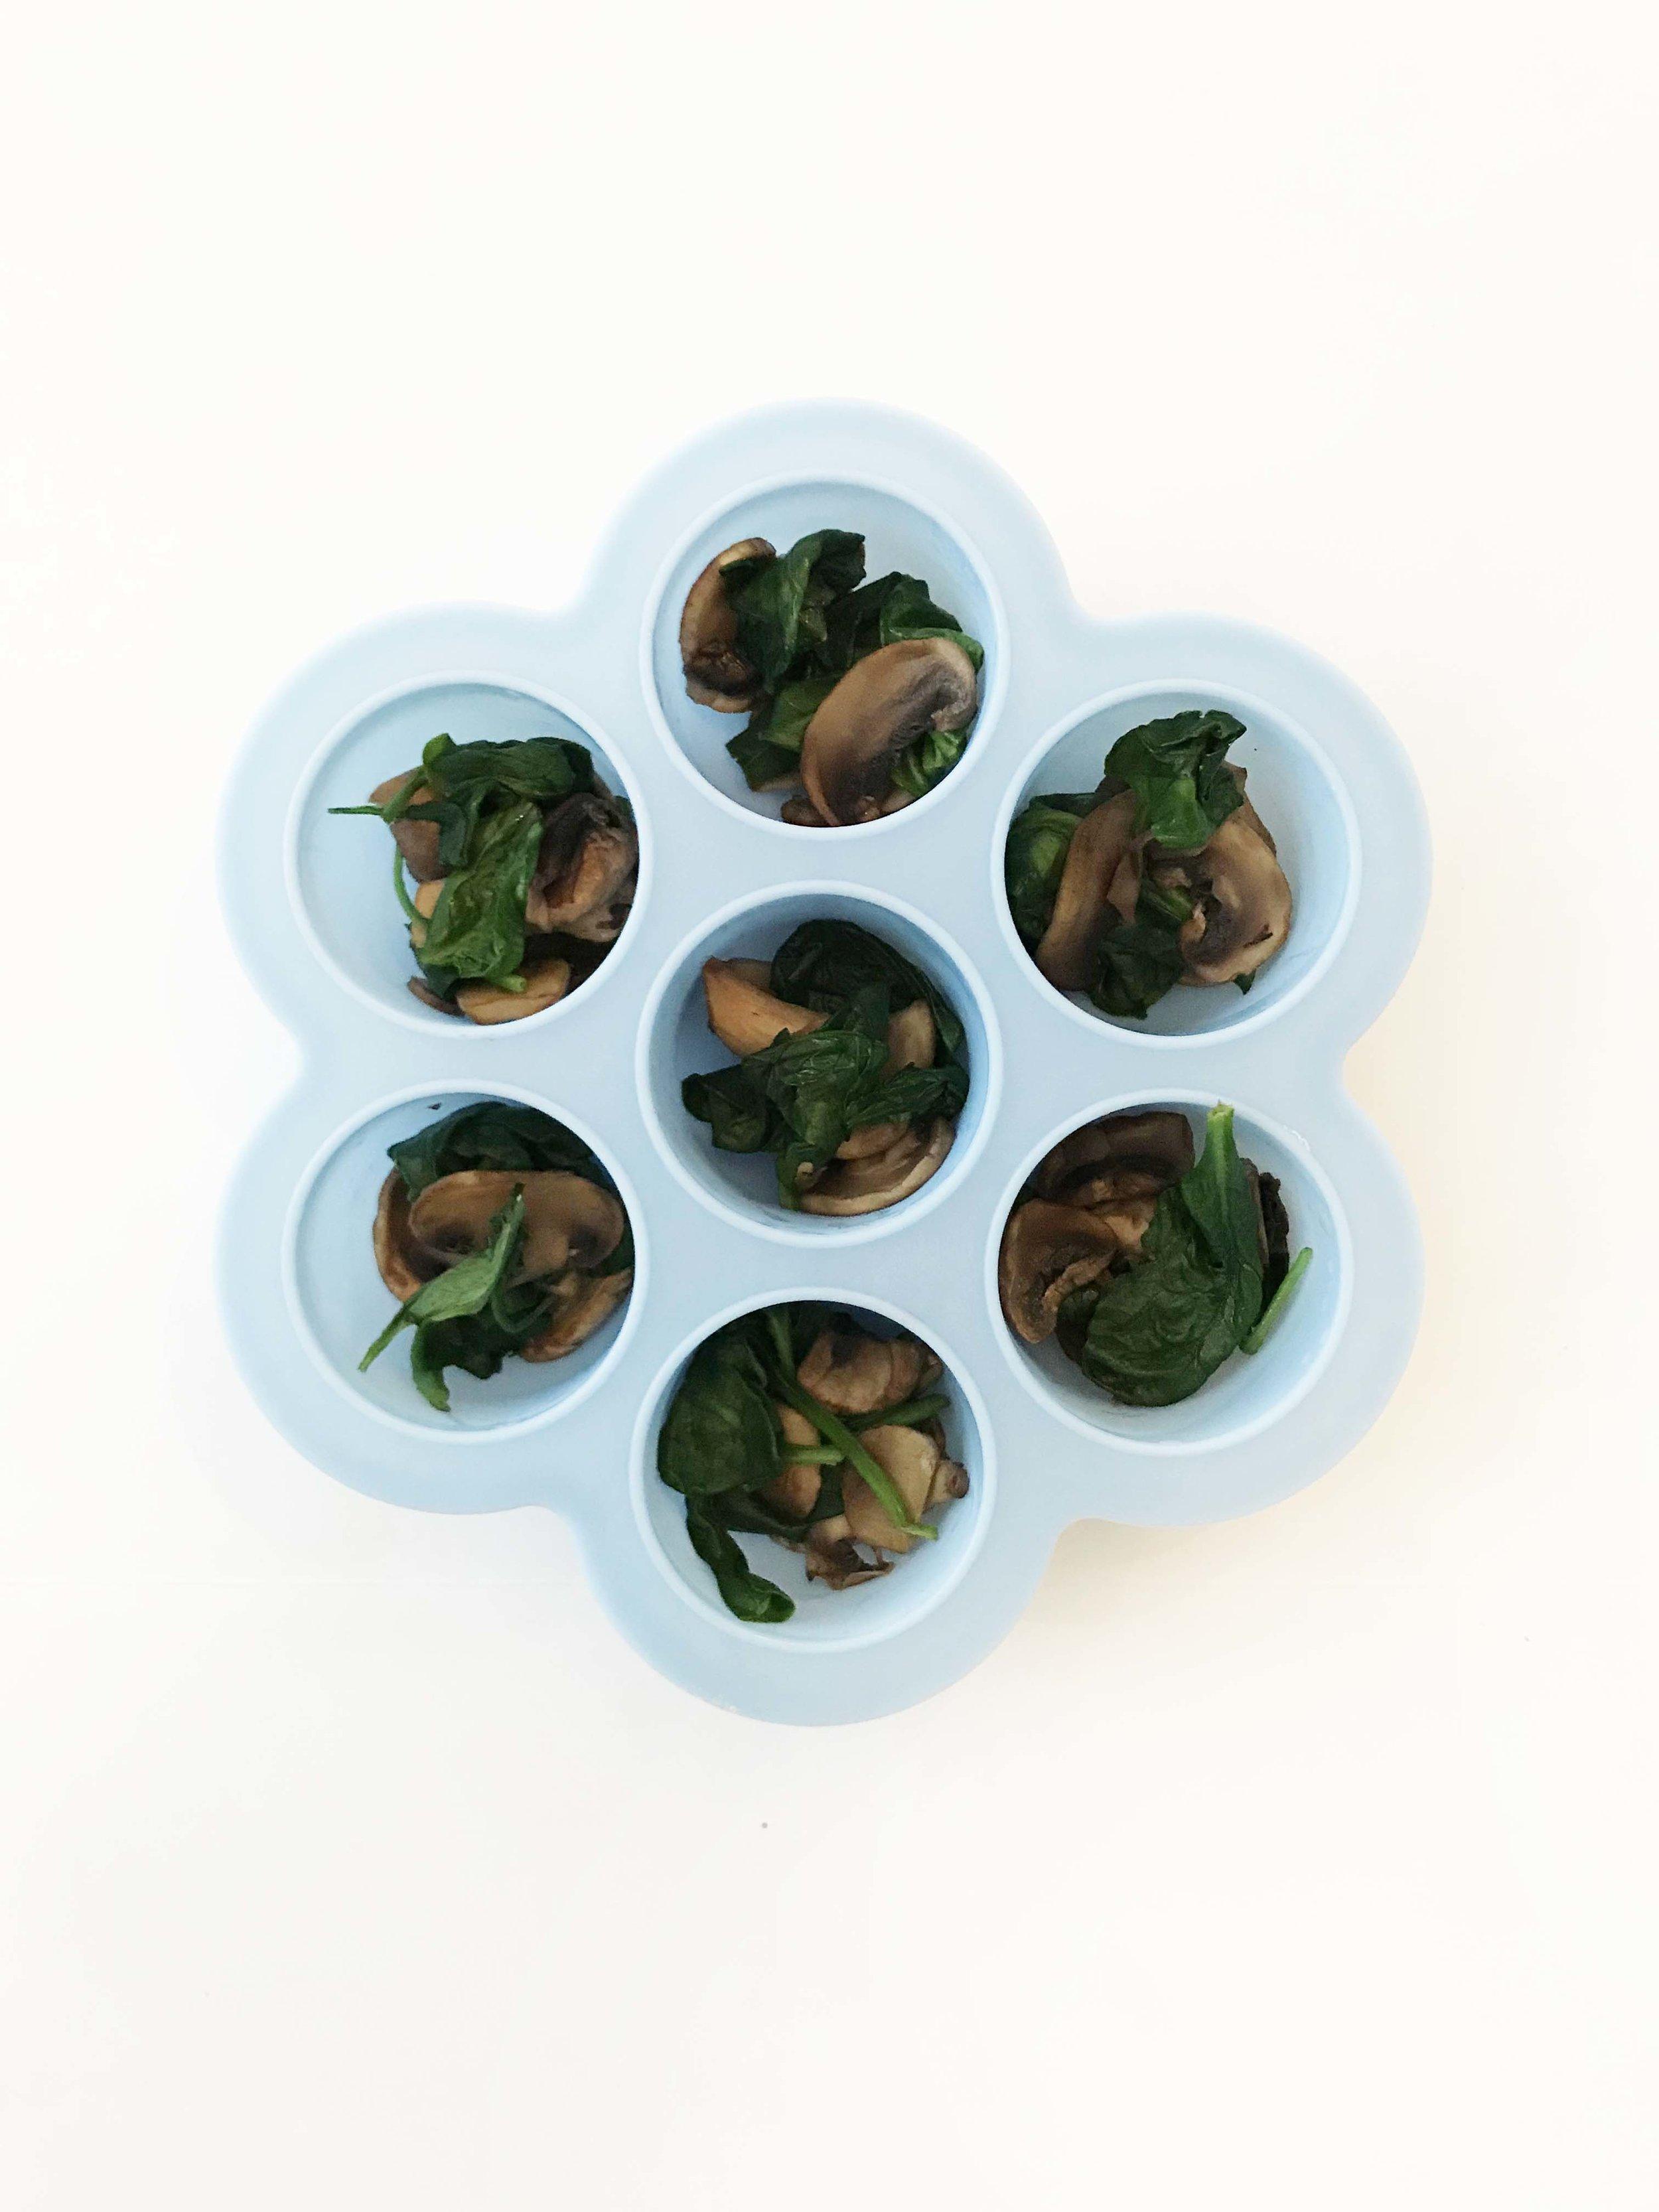 spinach-mushroom-egg-bites3.jpg